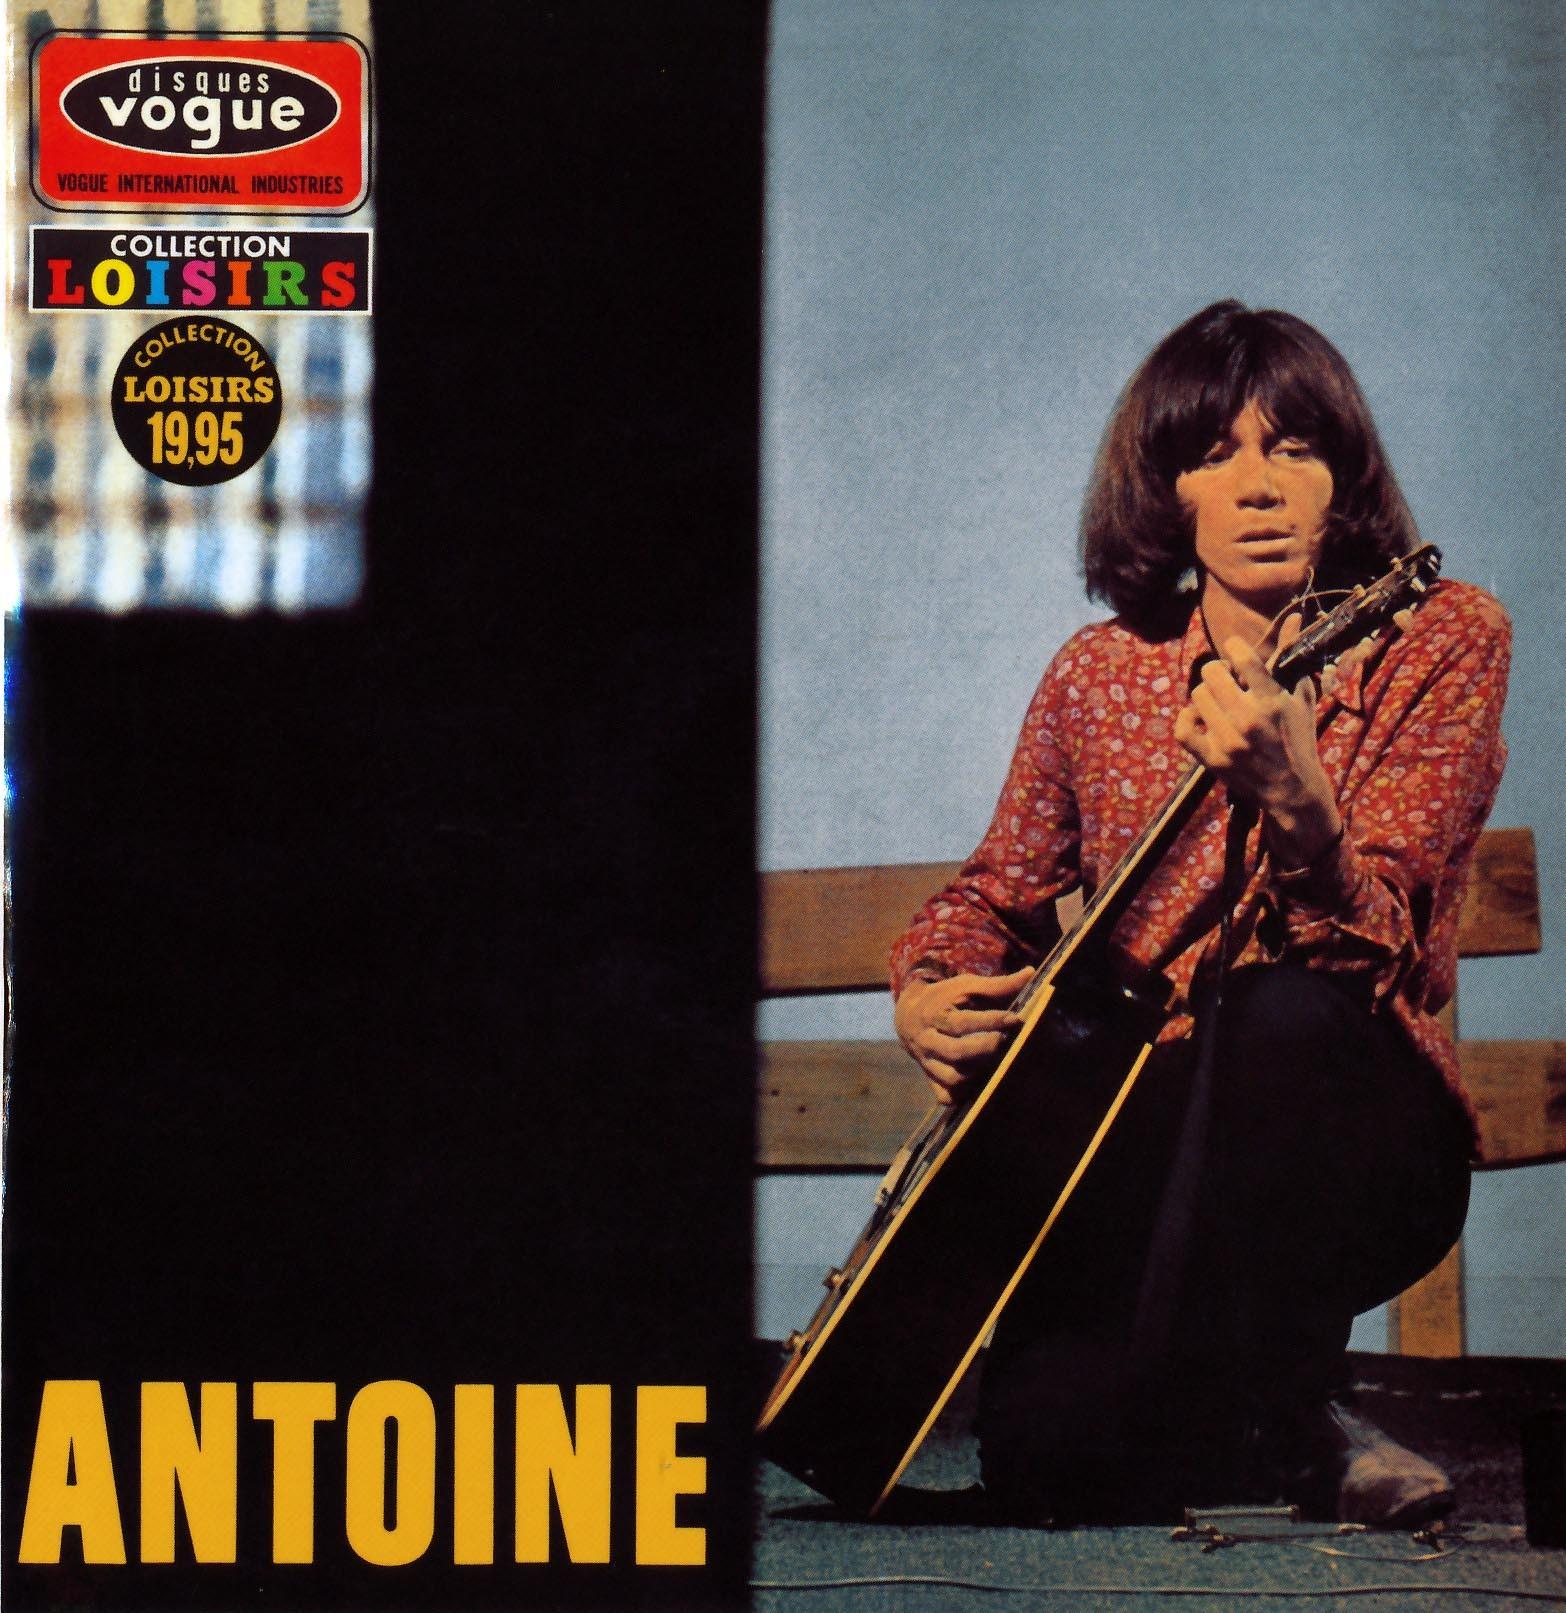 ANTOINE - CD